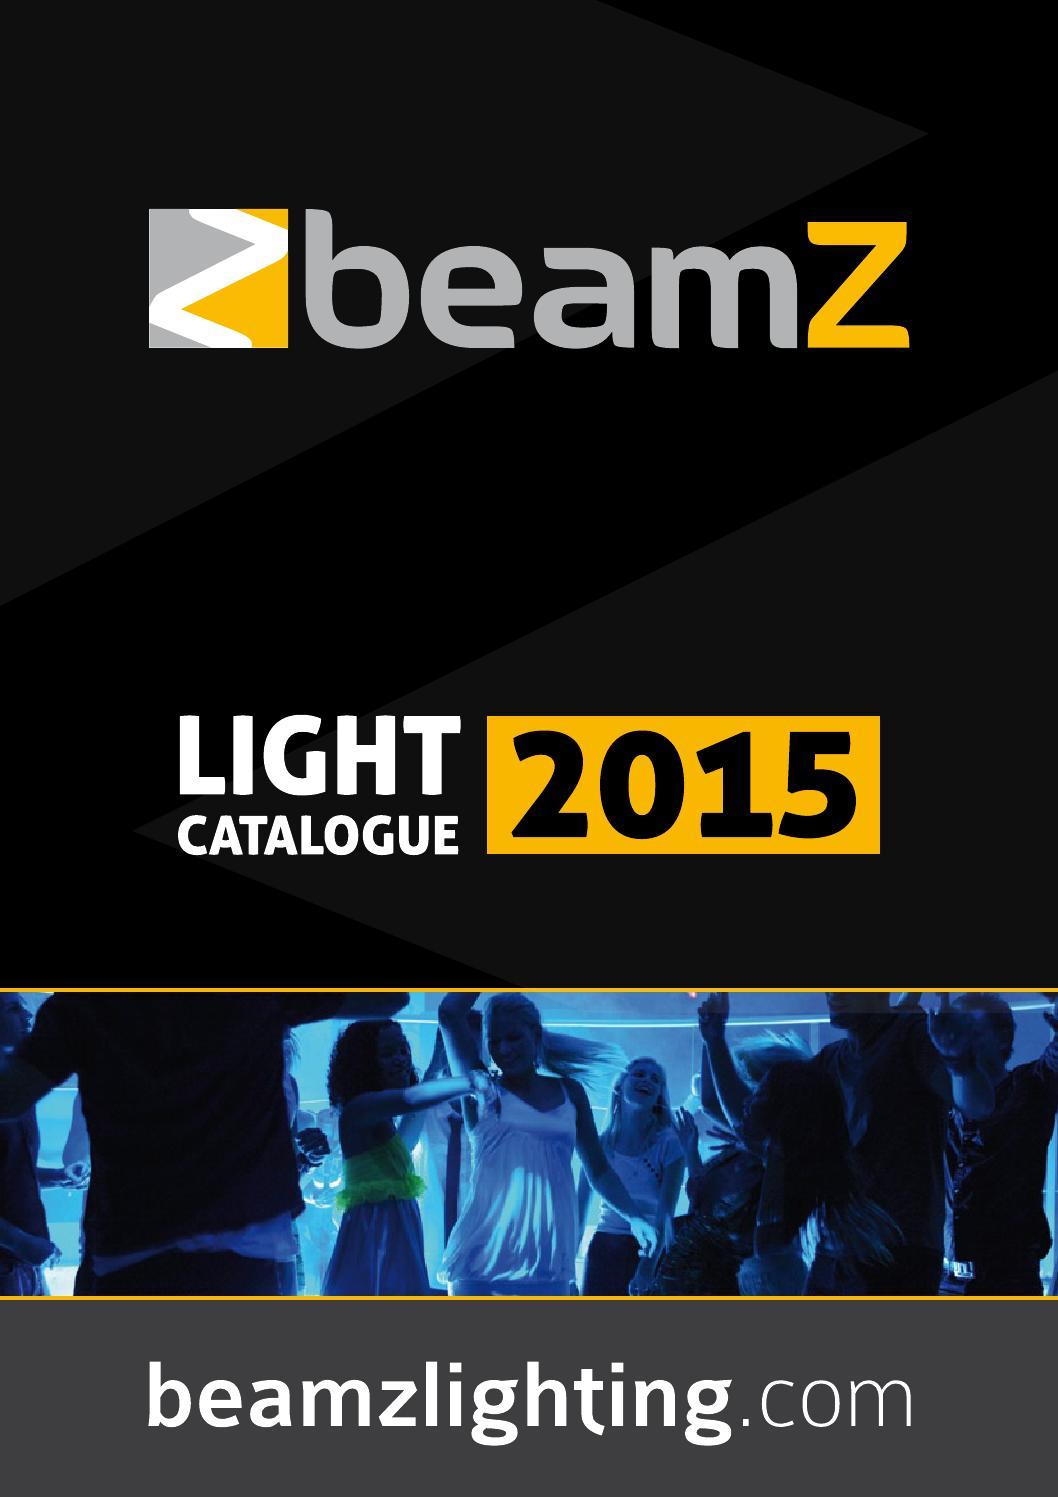 Beamz Light Catalogue 2015 English By Tronios Bv Issuu Sixled Bar Power Indicator Electronic Circuits